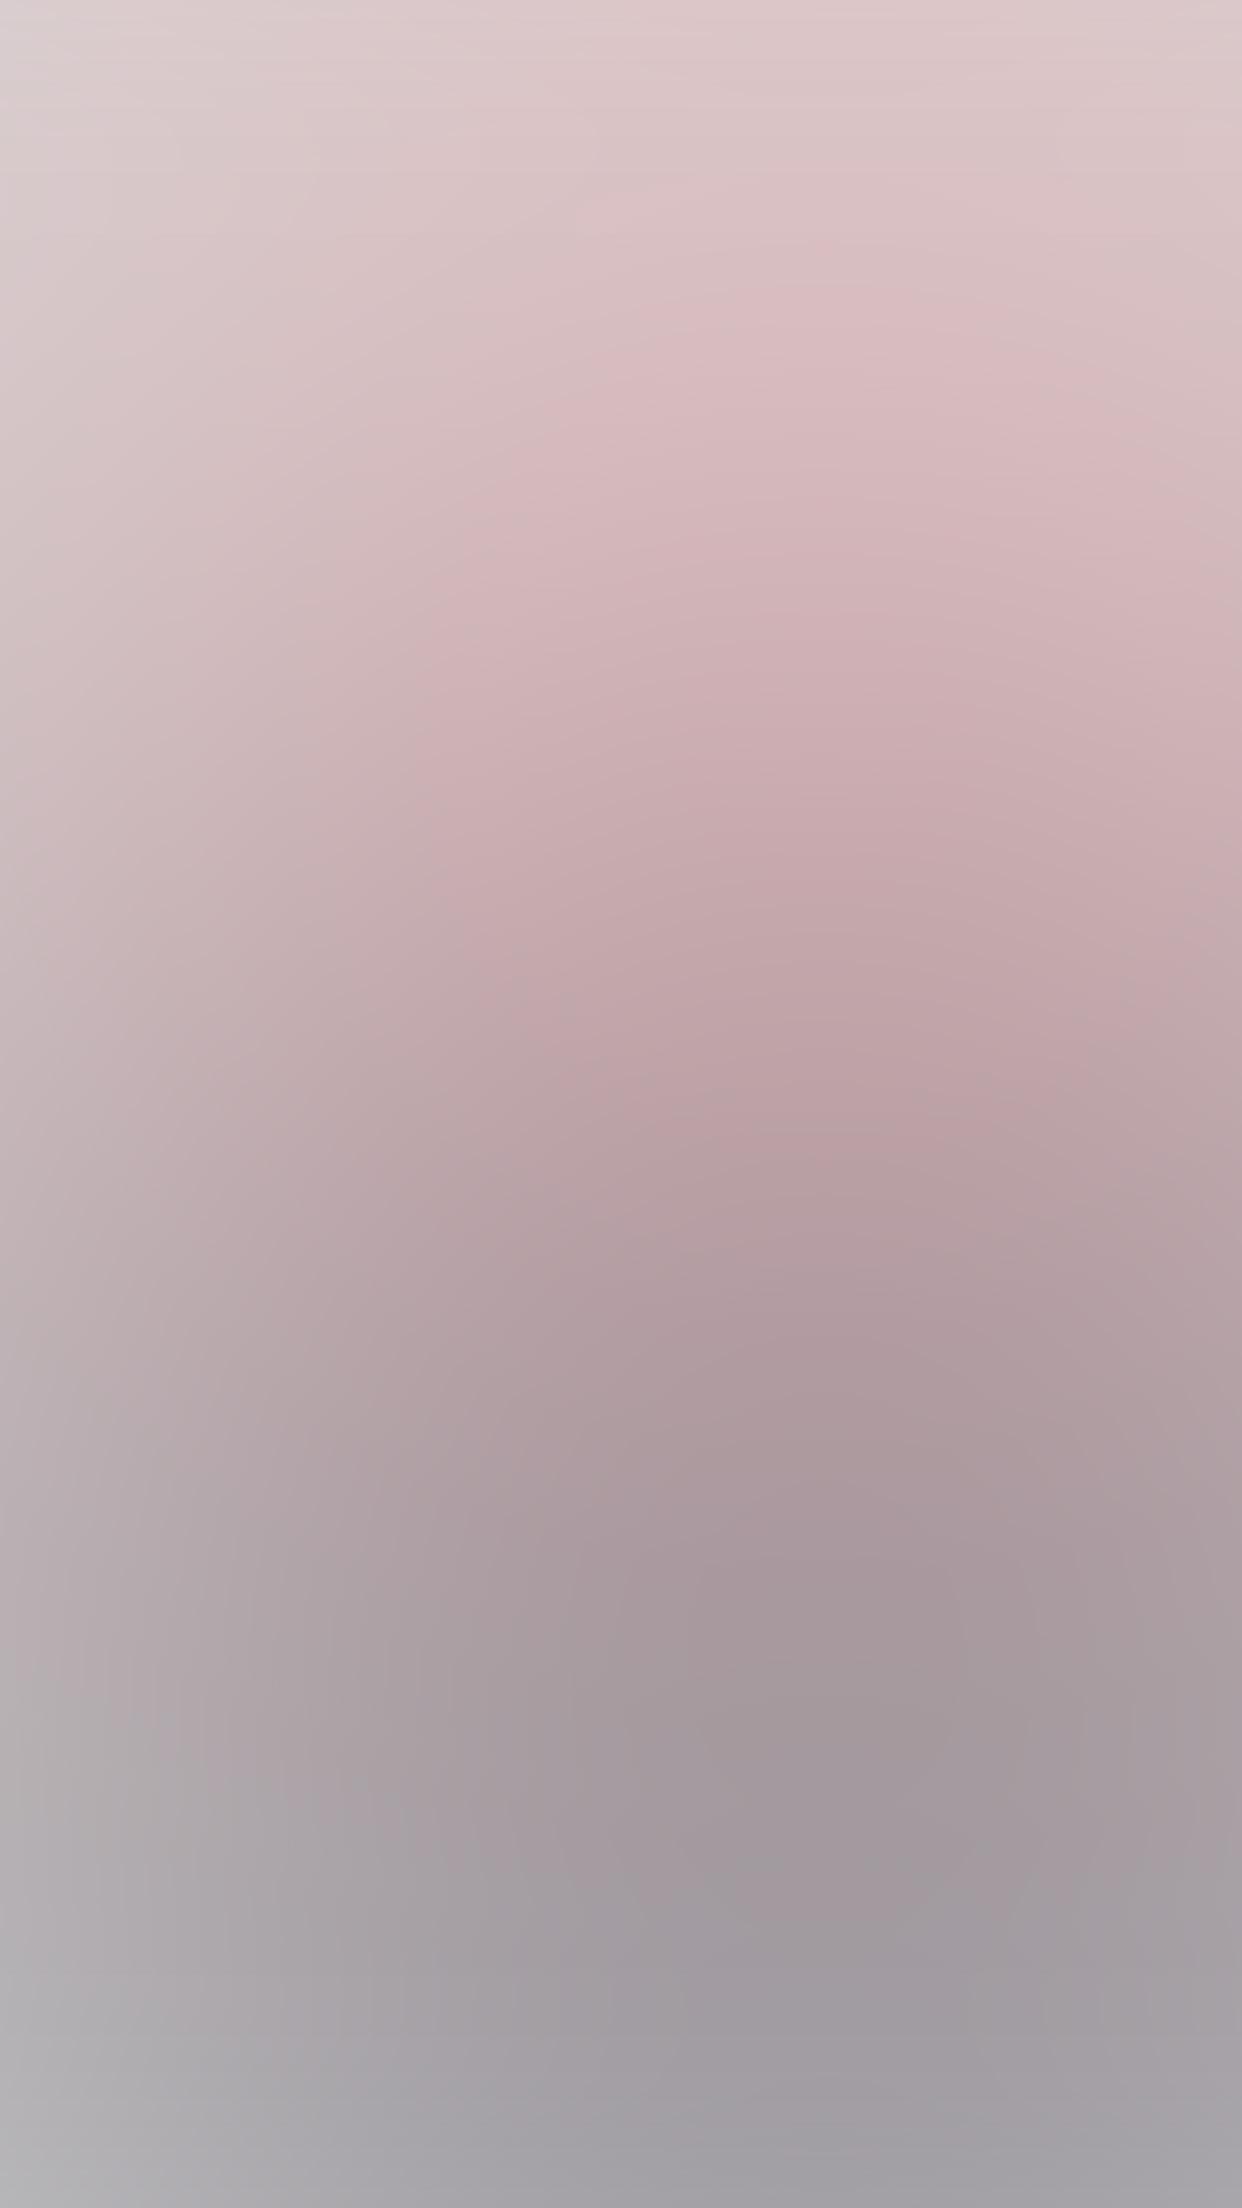 Iphone6papers Sg45 Flesh Inside White Calm Gradation Blur